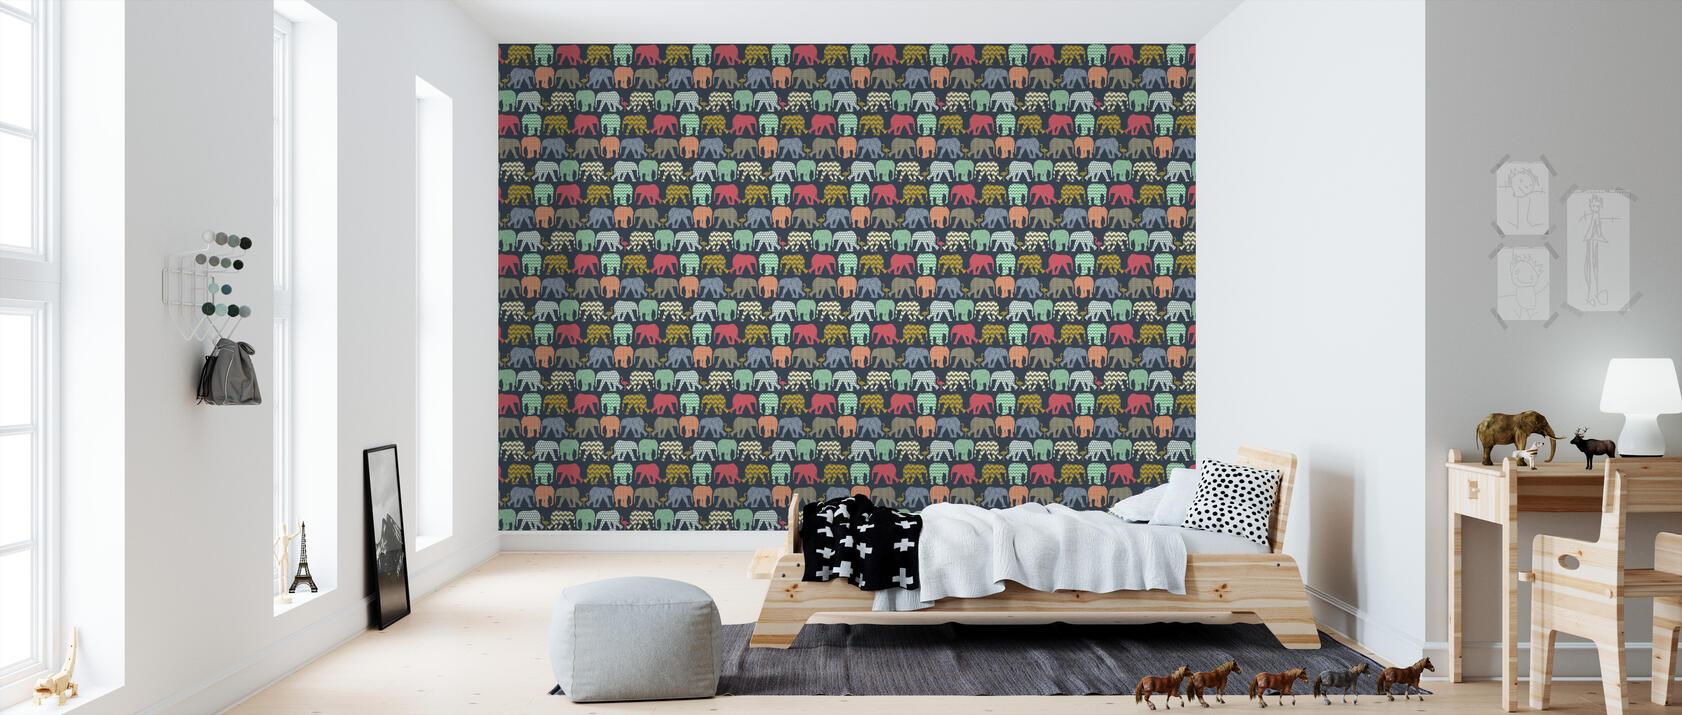 Baby elephants and flamingos 1 papel pintado for Papel pintado personalizado